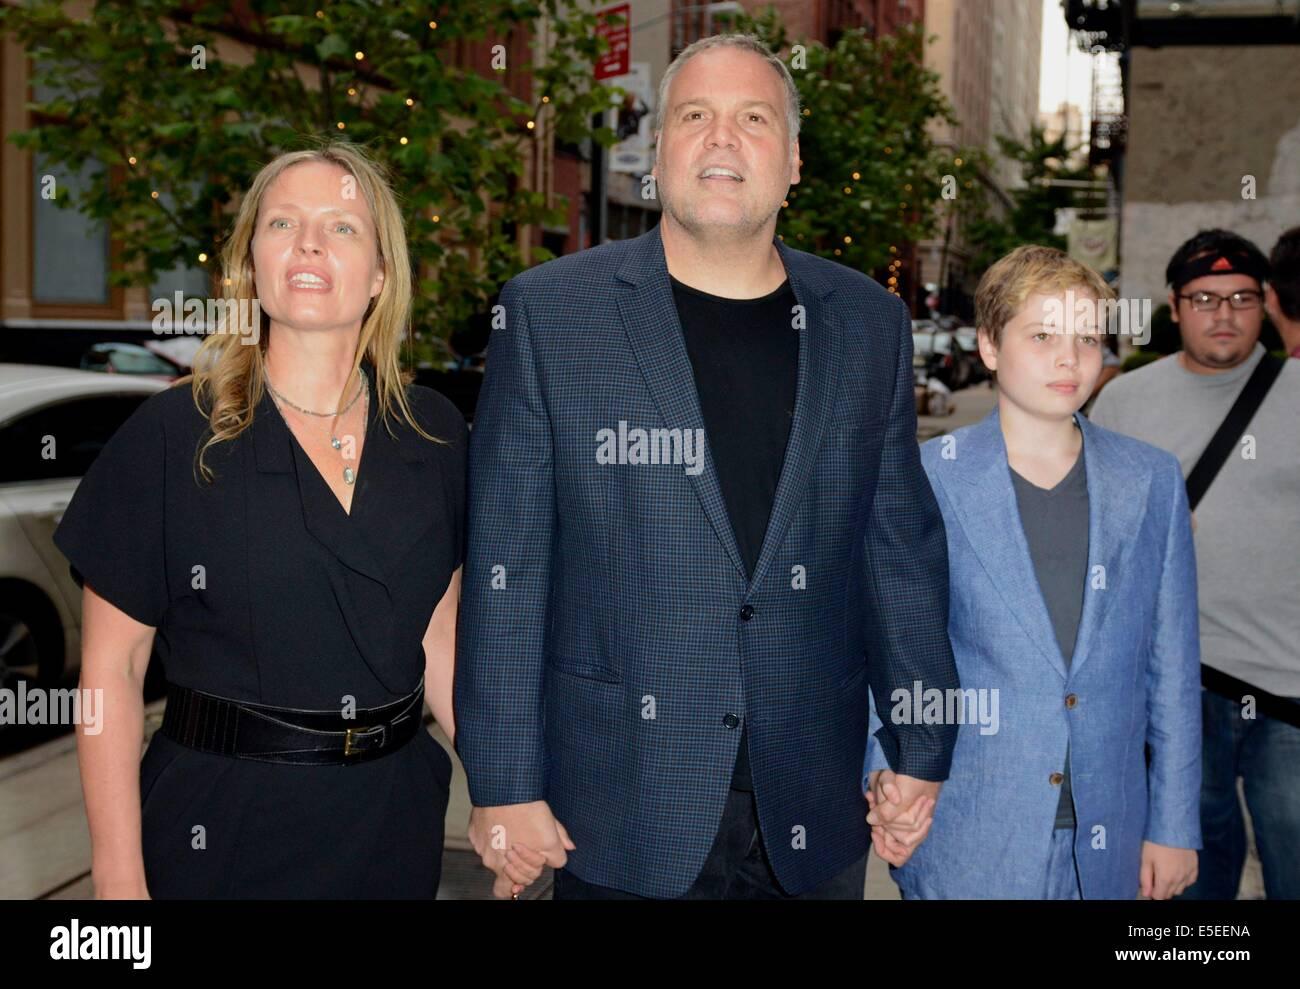 New york ny usa. 29. juli 2014. vincent donofrio mit frau carin